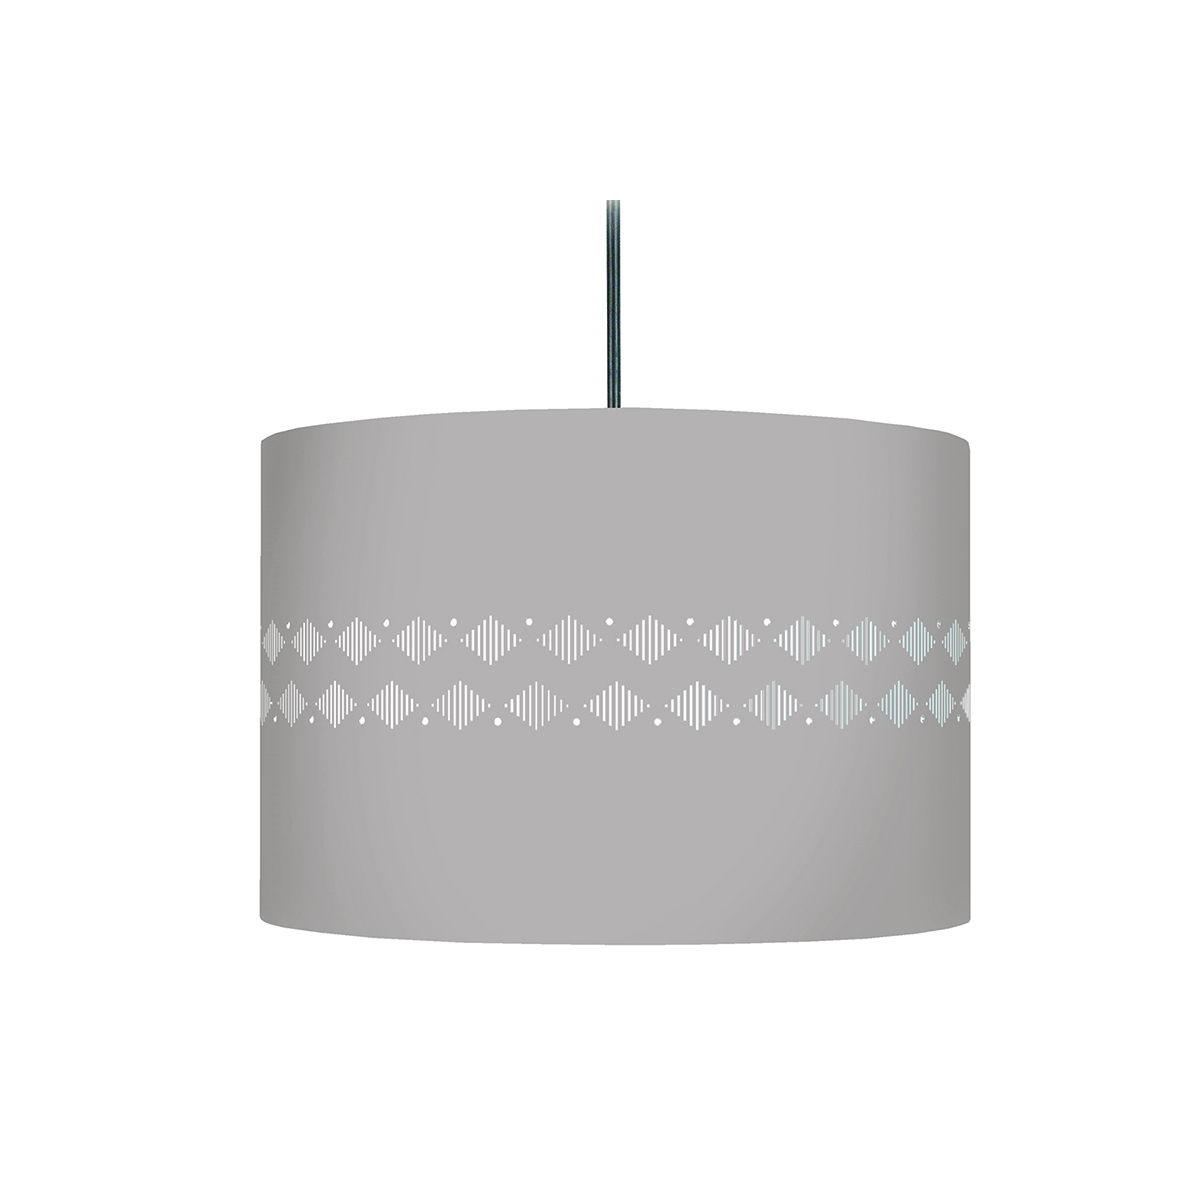 Lampadario design Talpa SMART